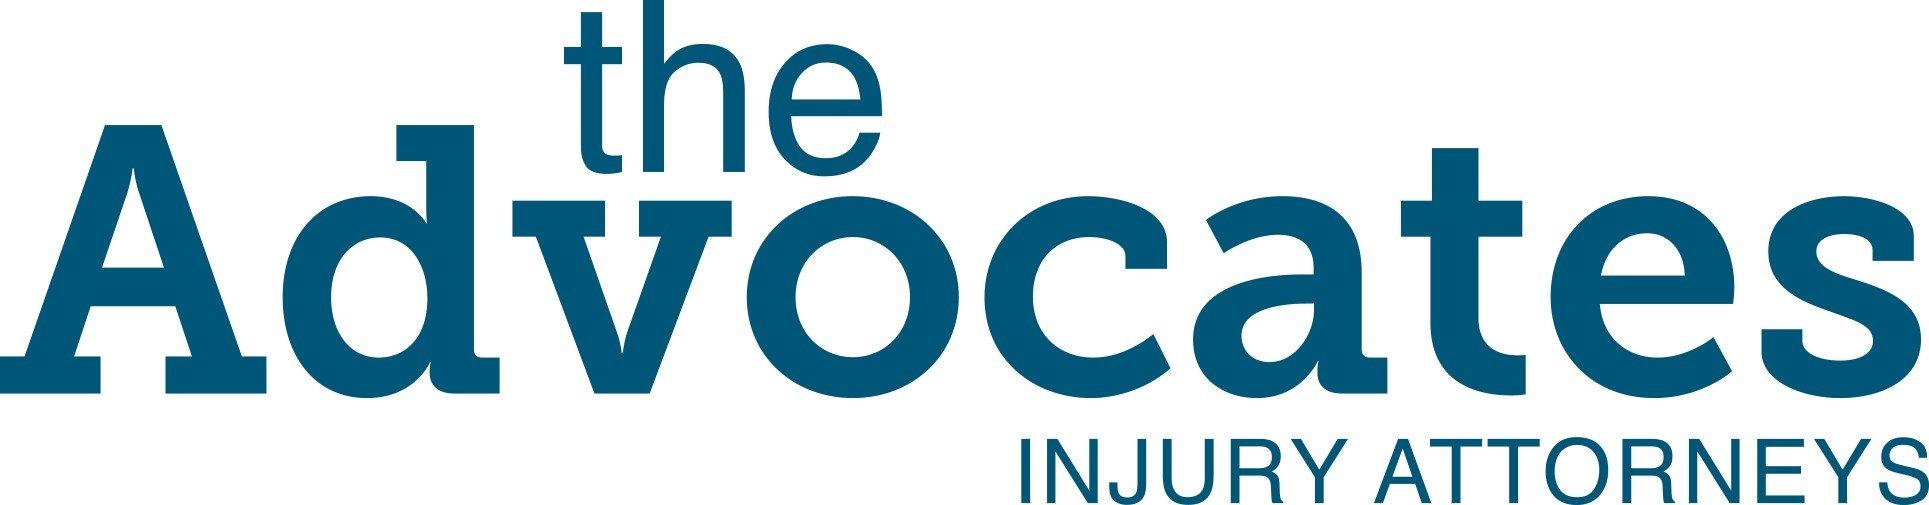 The Advocates - Injury Attorneys